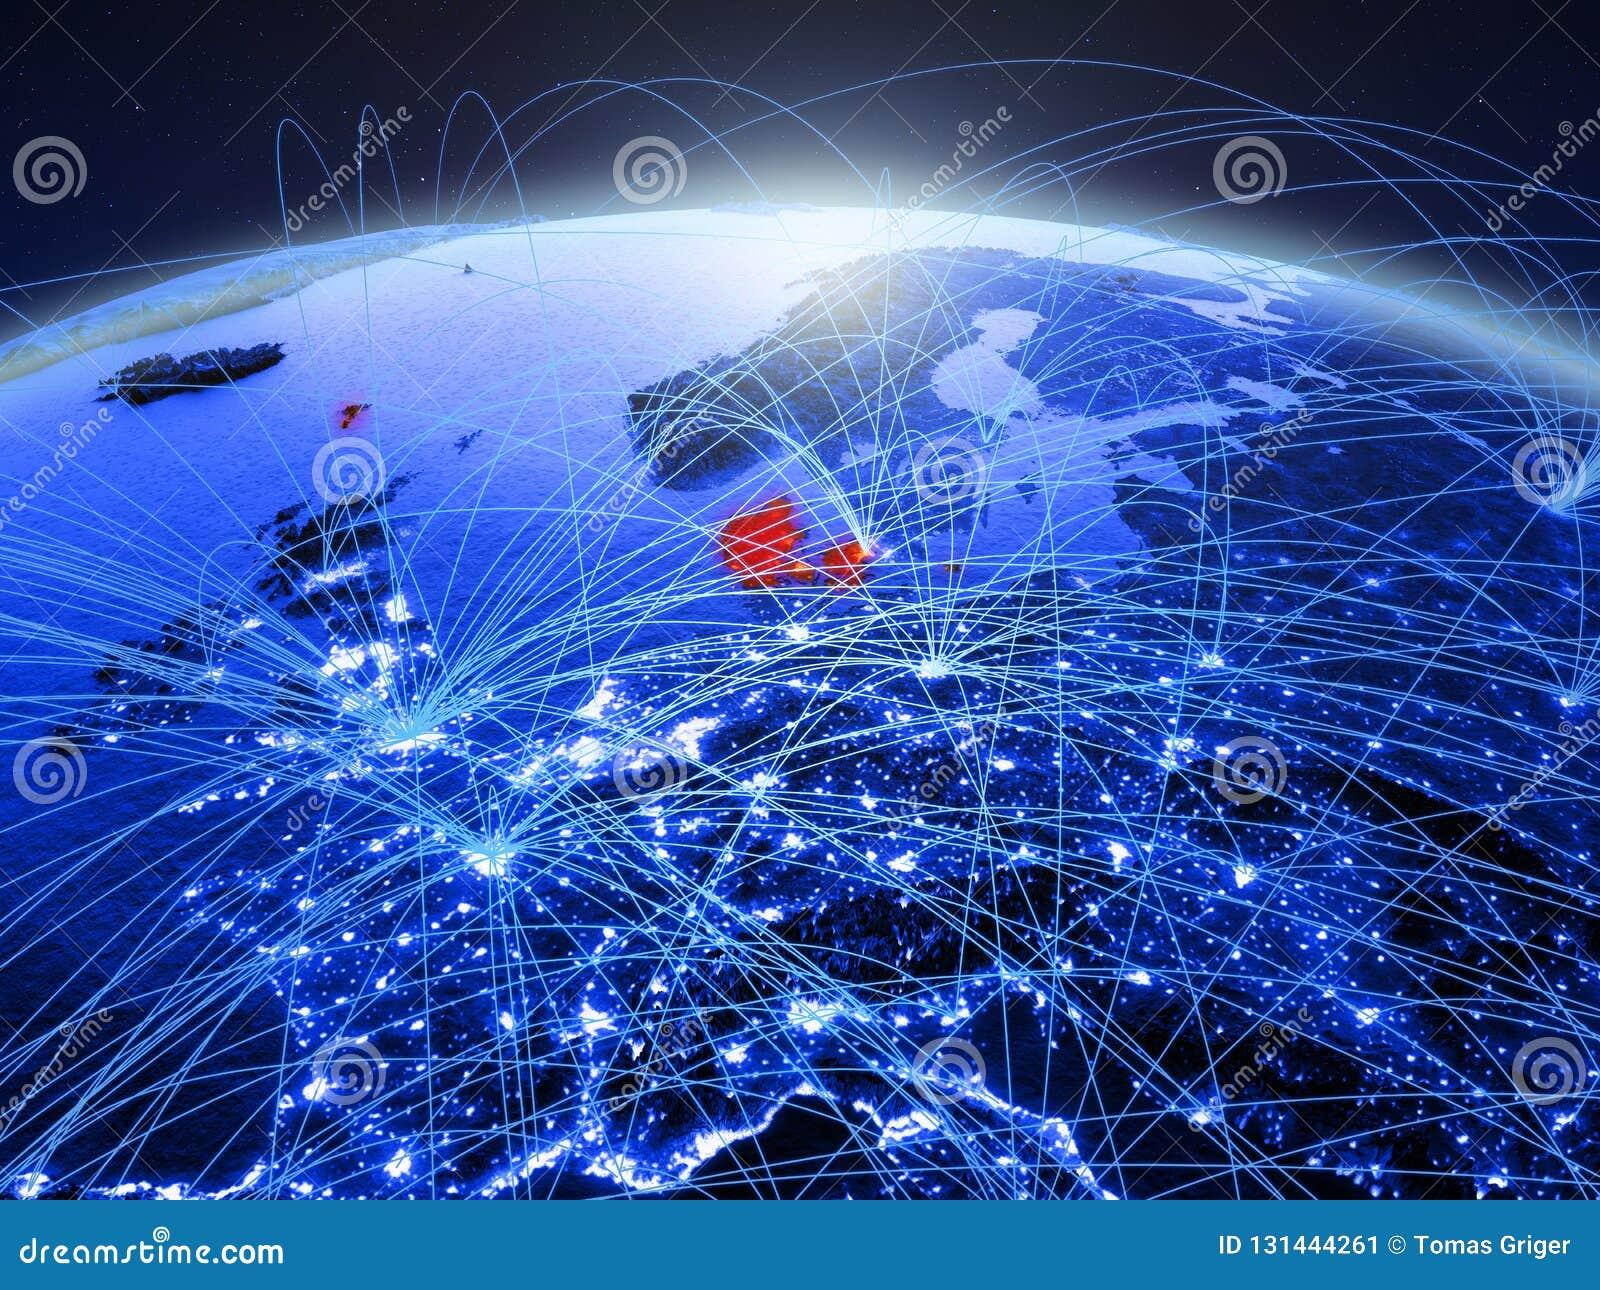 Denemarken op blauwe digitale aarde met internationaal netwerk die mededeling, reis en verbindingen vertegenwoordigen 3d